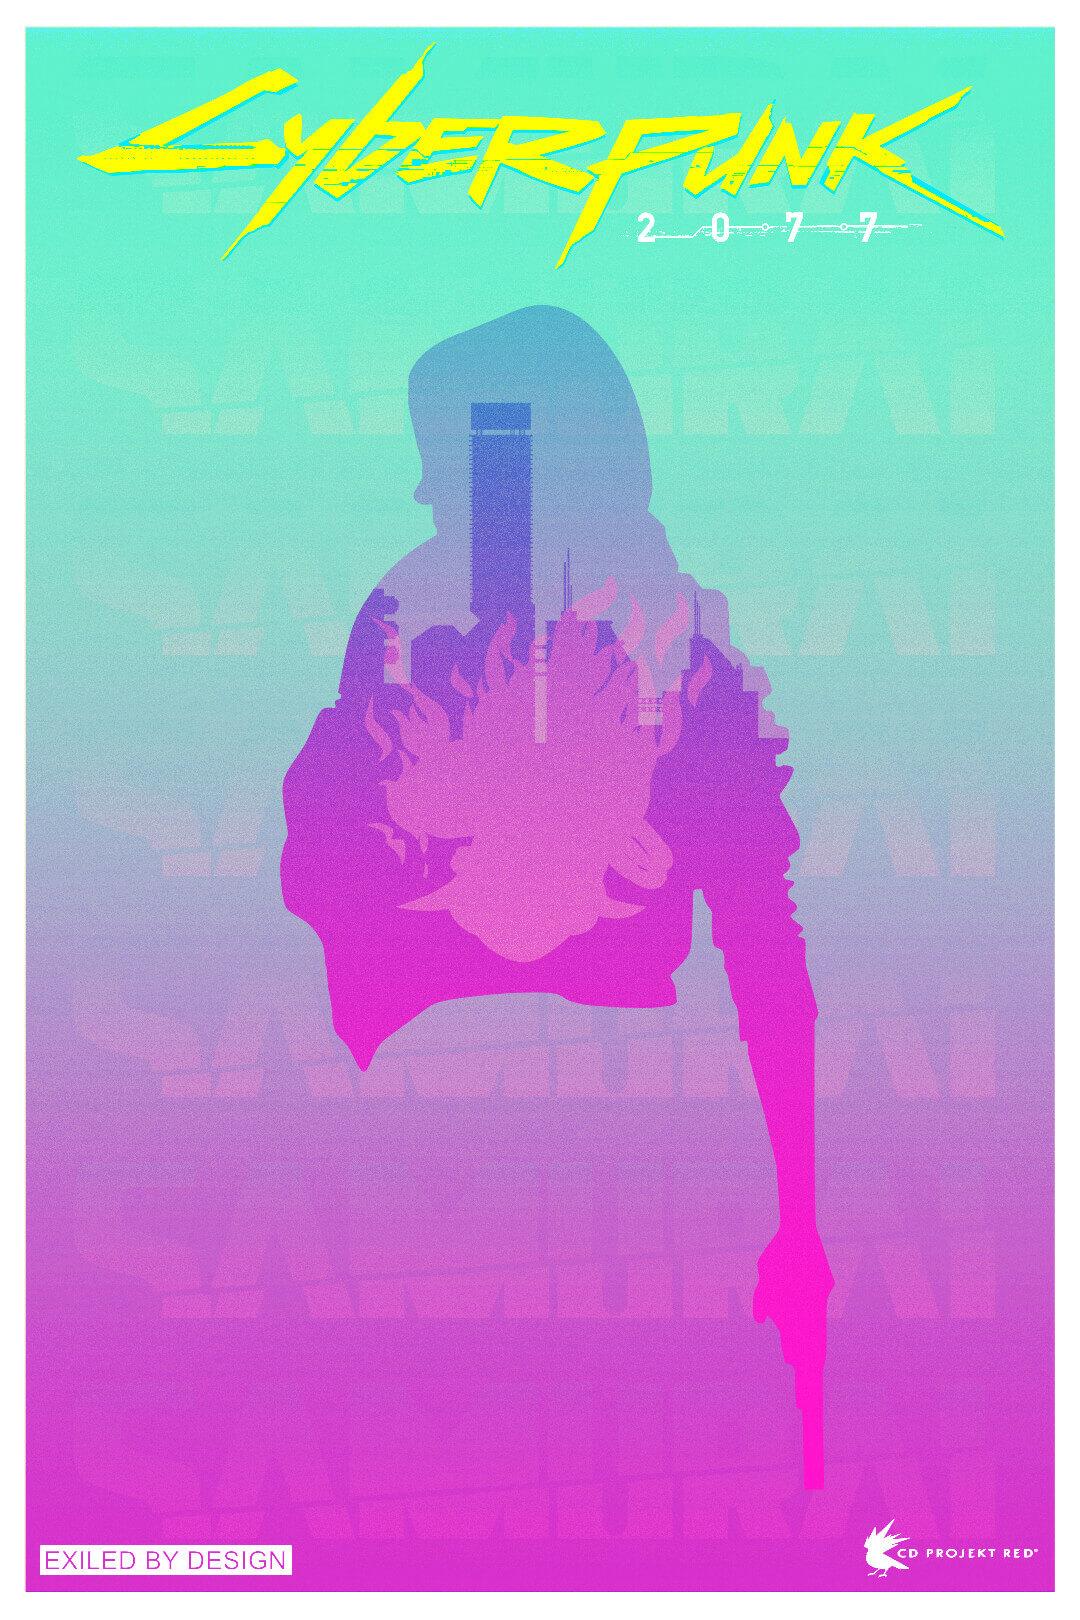 James Abels – Minimal Cyberpunk 2077 Poster